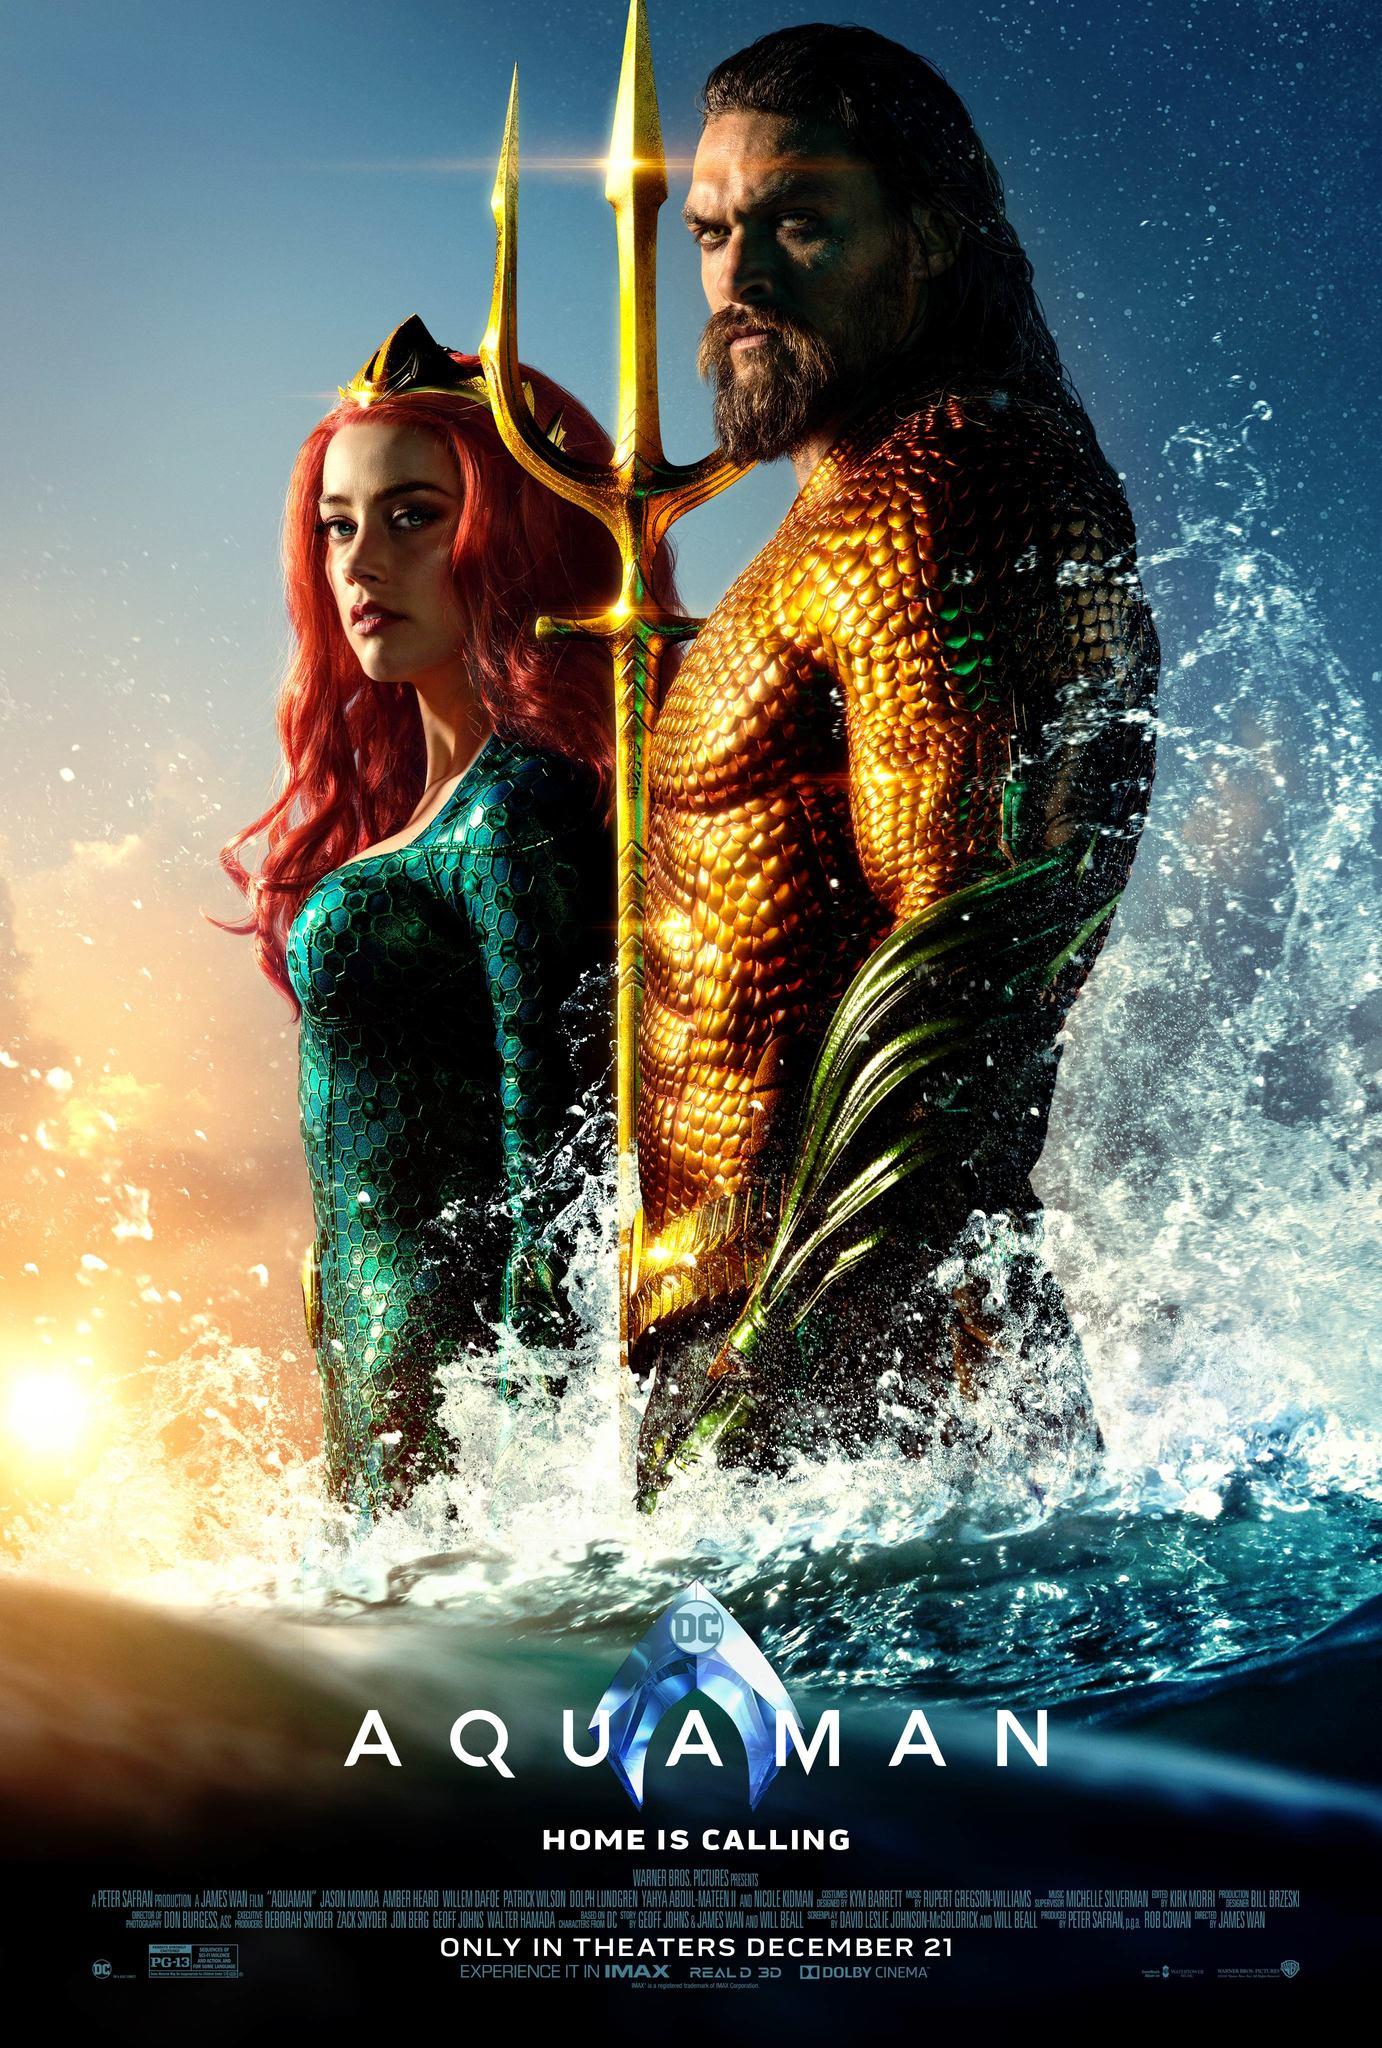 Aquaman (2018) BluRay 480p, 720p, 1080p & 4K-2160p